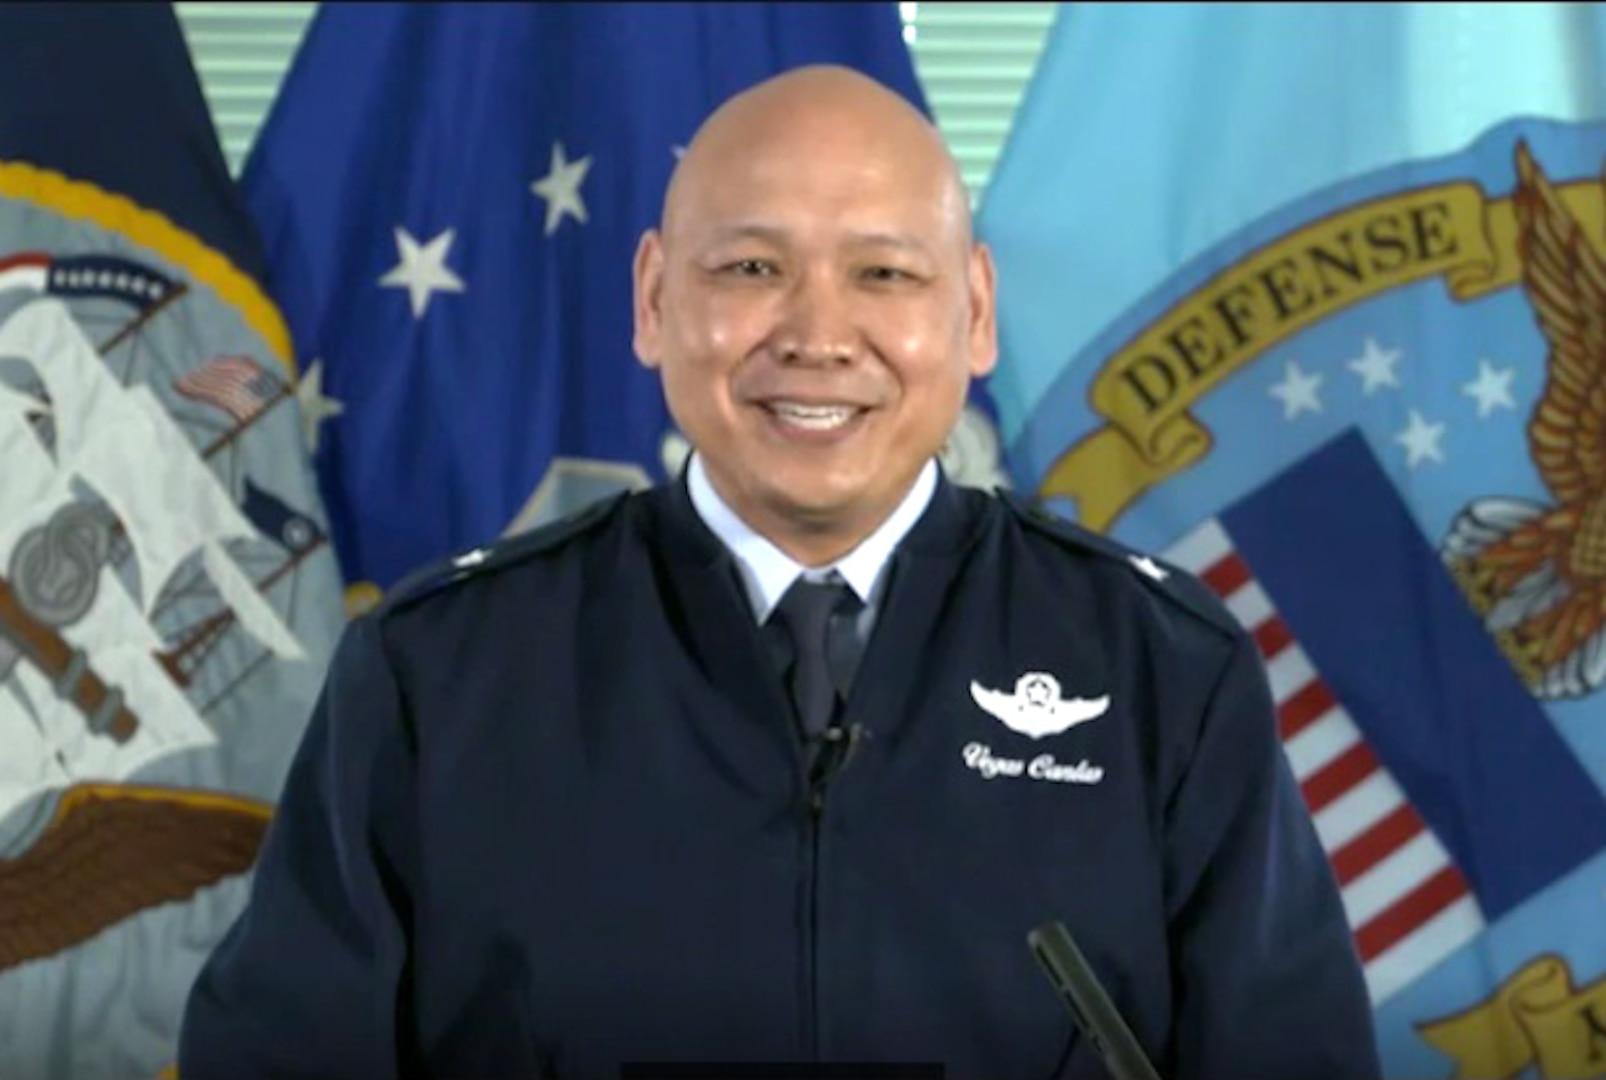 Defense Logistics Agency Energy Commander Air Force Brig. Gen. Jimmy Canlas